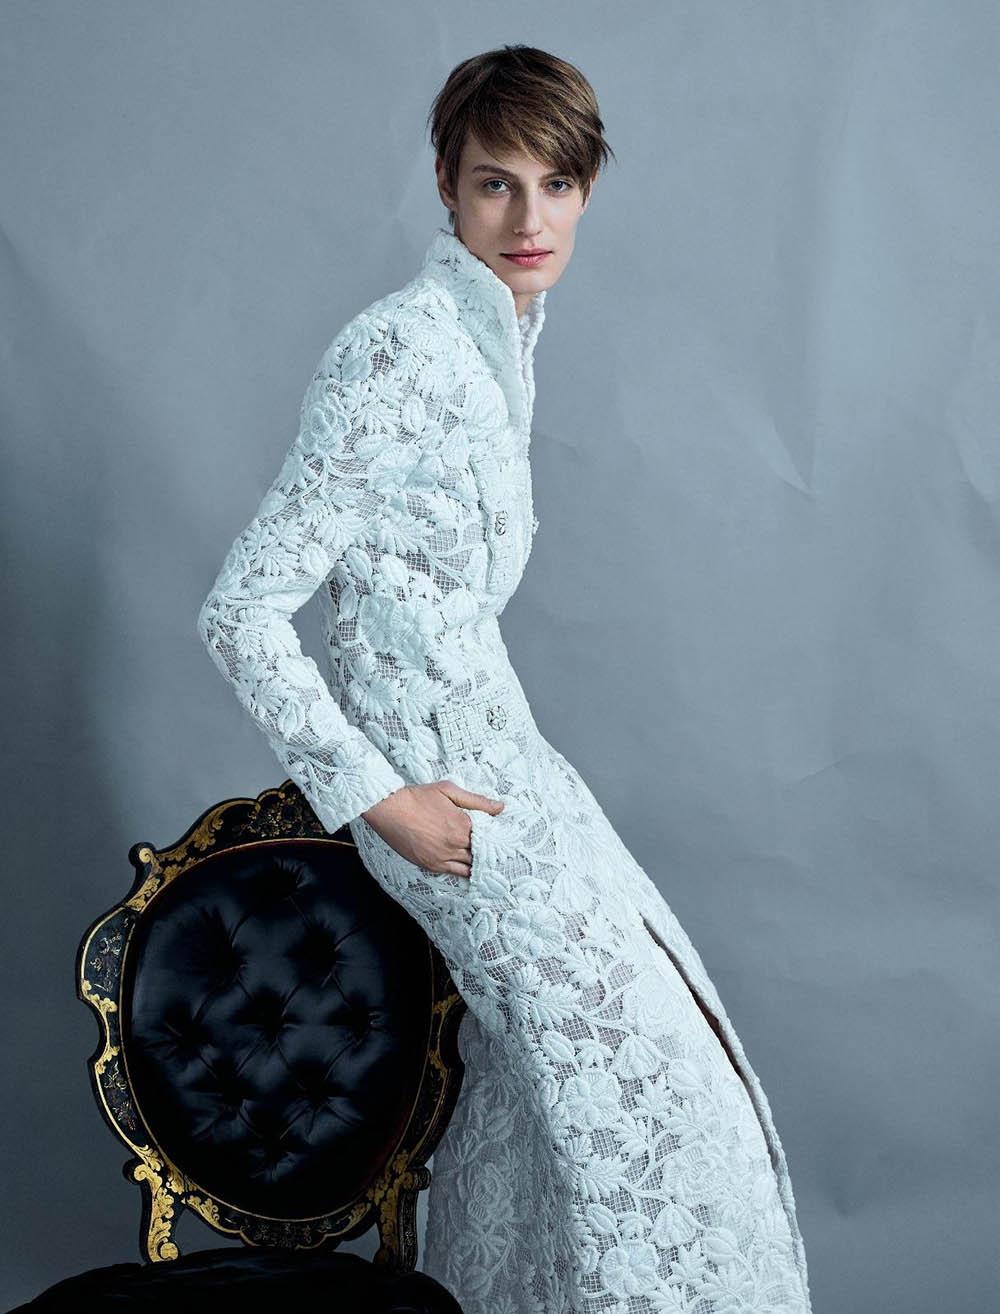 Veronika Kunz covers Numéro March 2020 by Jean-Baptiste Mondino